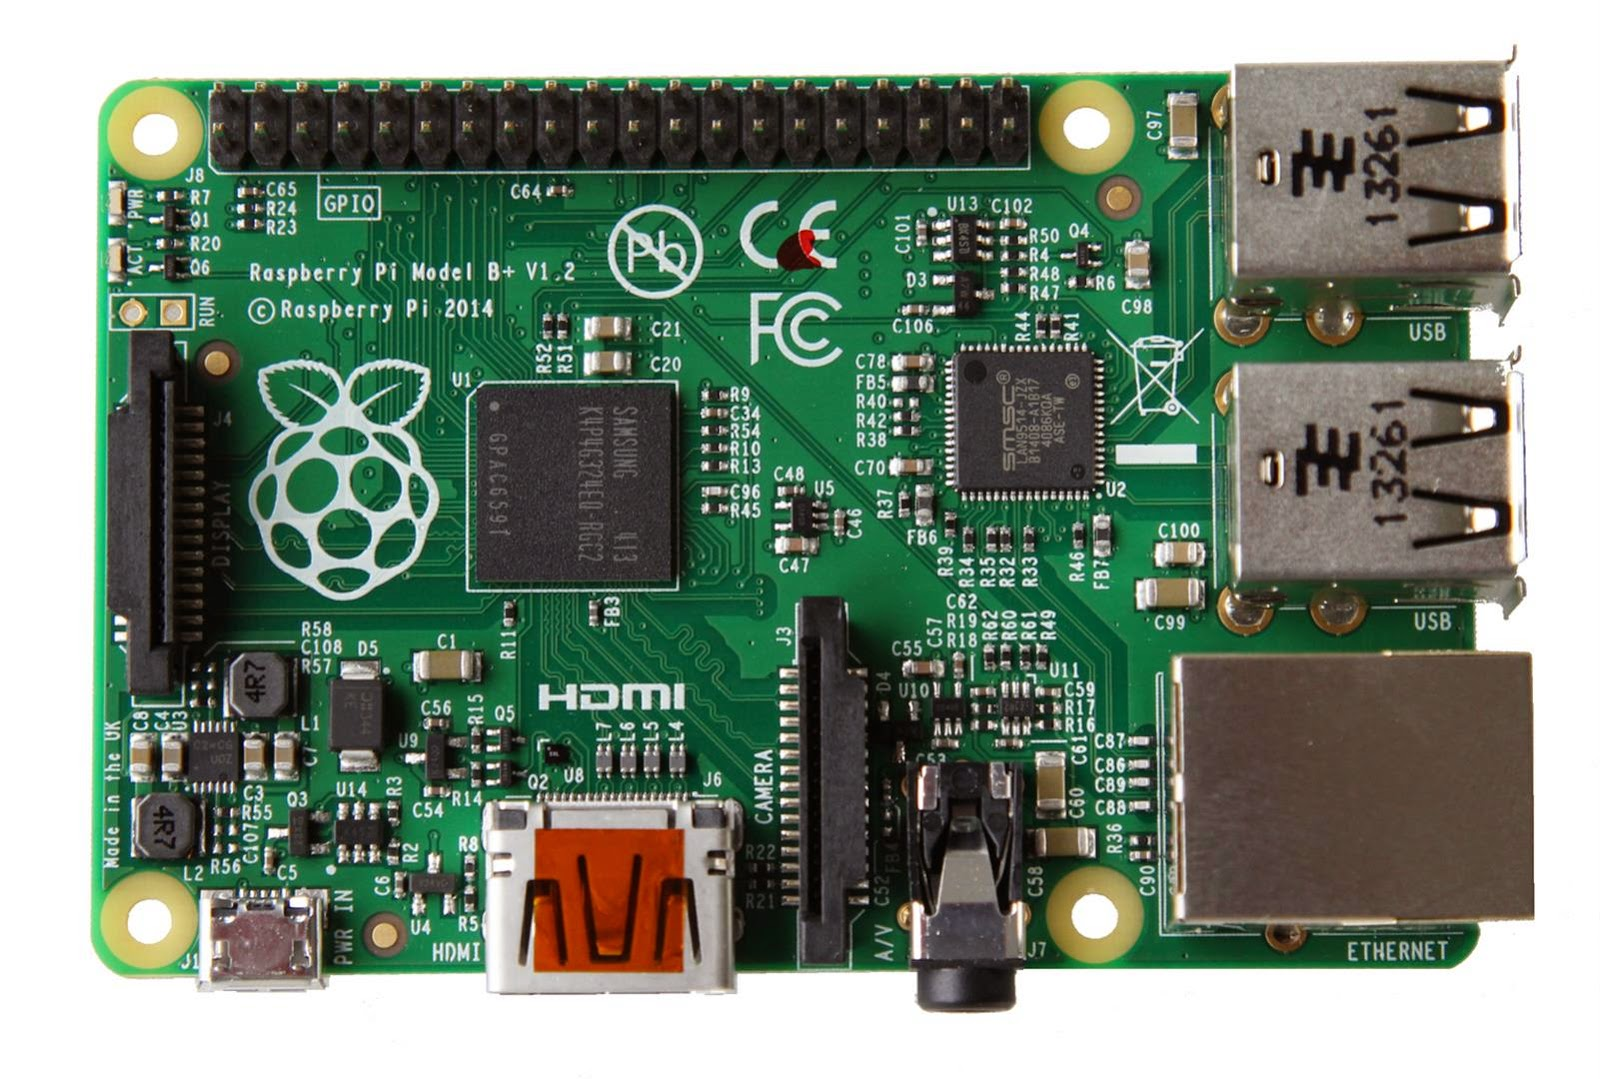 Raspberry Pi B+ front